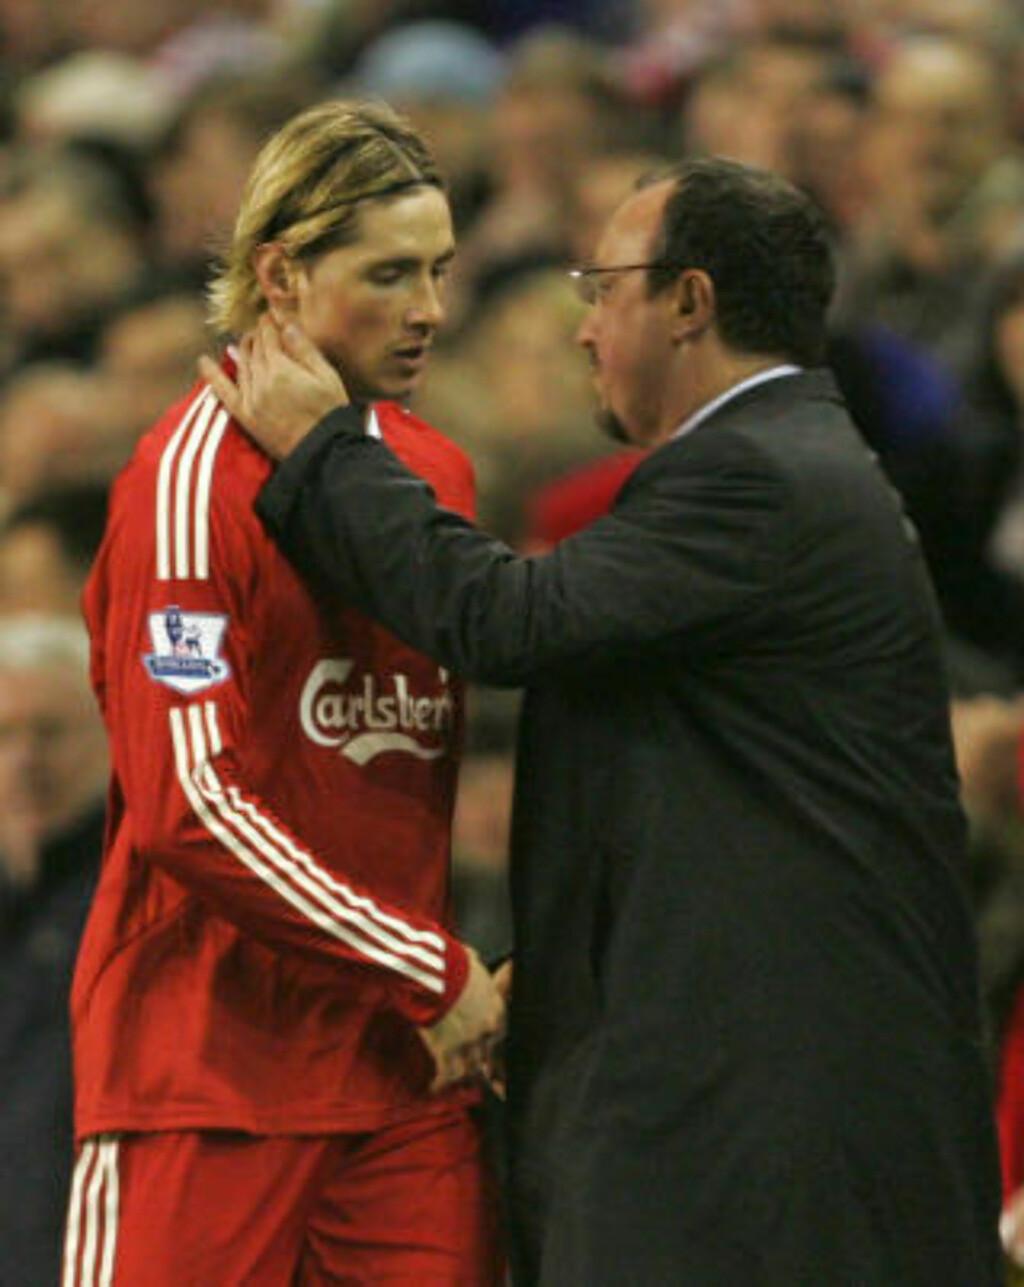 TOMÅL-TORRES: Rafael Benitez tok ut både Fernando Torres og Gerrard i 2. omgang, trolig for å spare stjernene til torsdagens Lille-møte. Foto: AP/Tim Hales